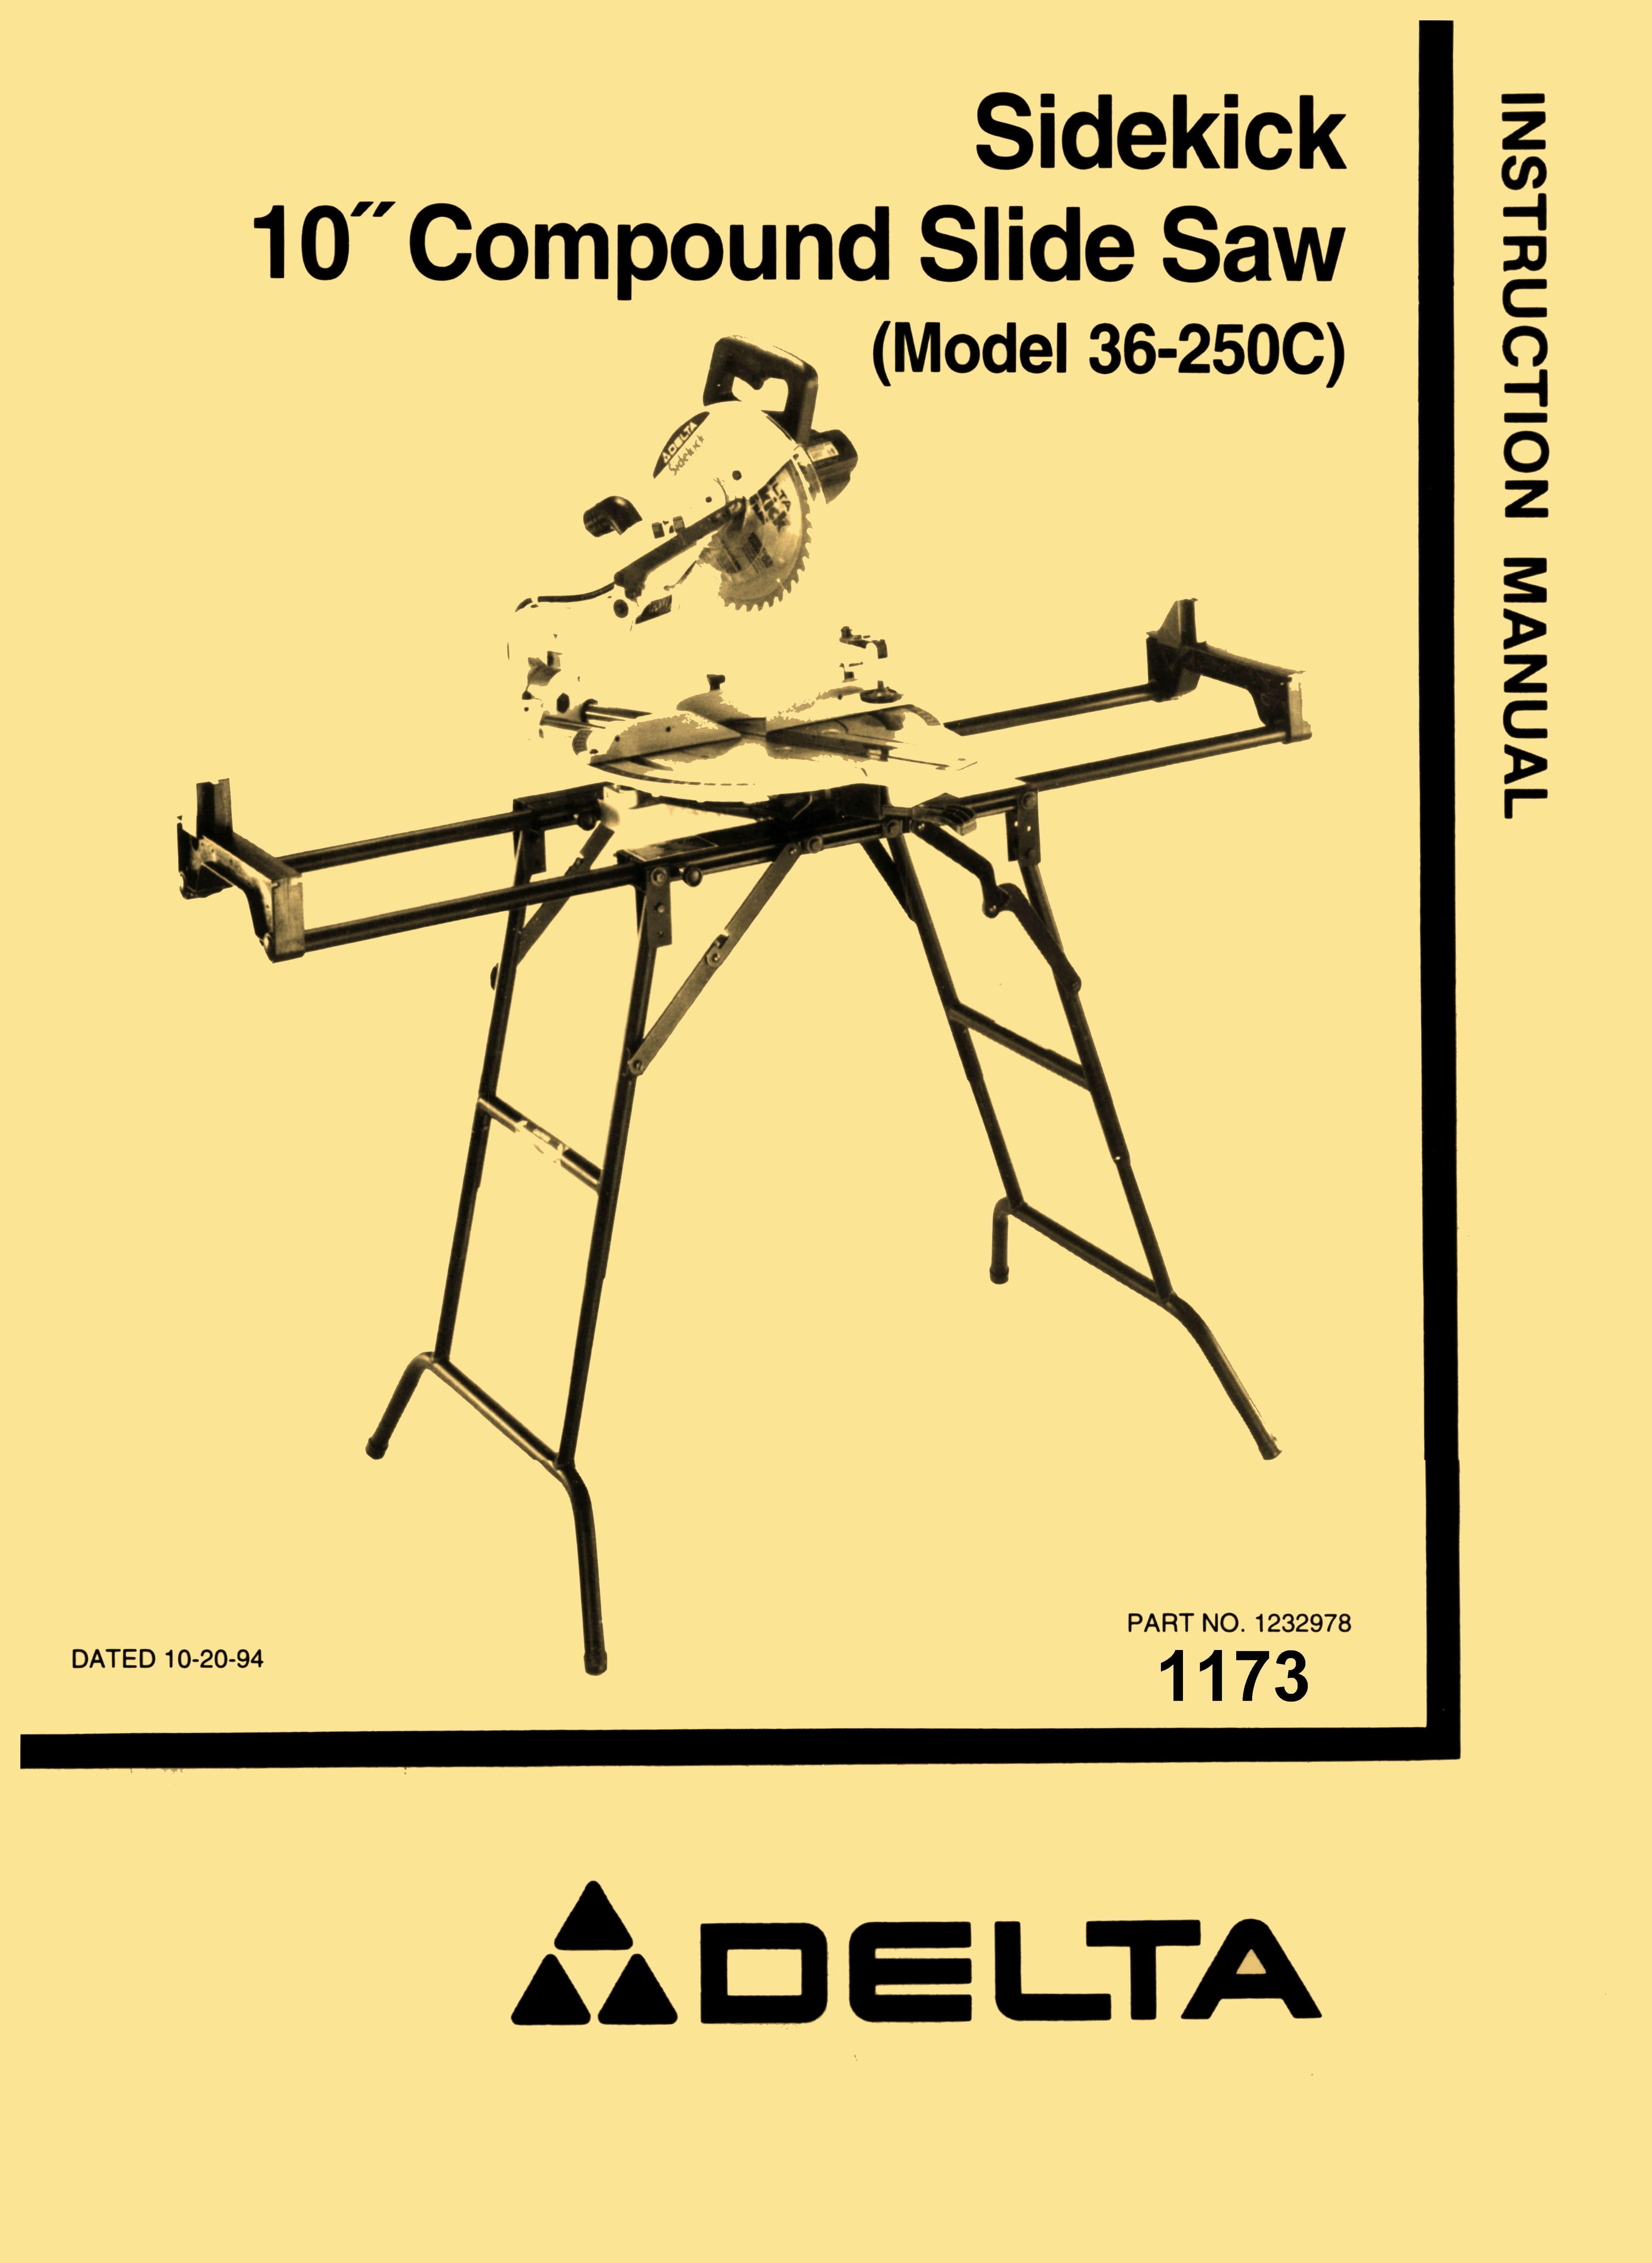 delta 36 250c 10 sidekick slide saw instructions parts manual rh pinterest com Owner's Manual Wildgame Innovations Manuals